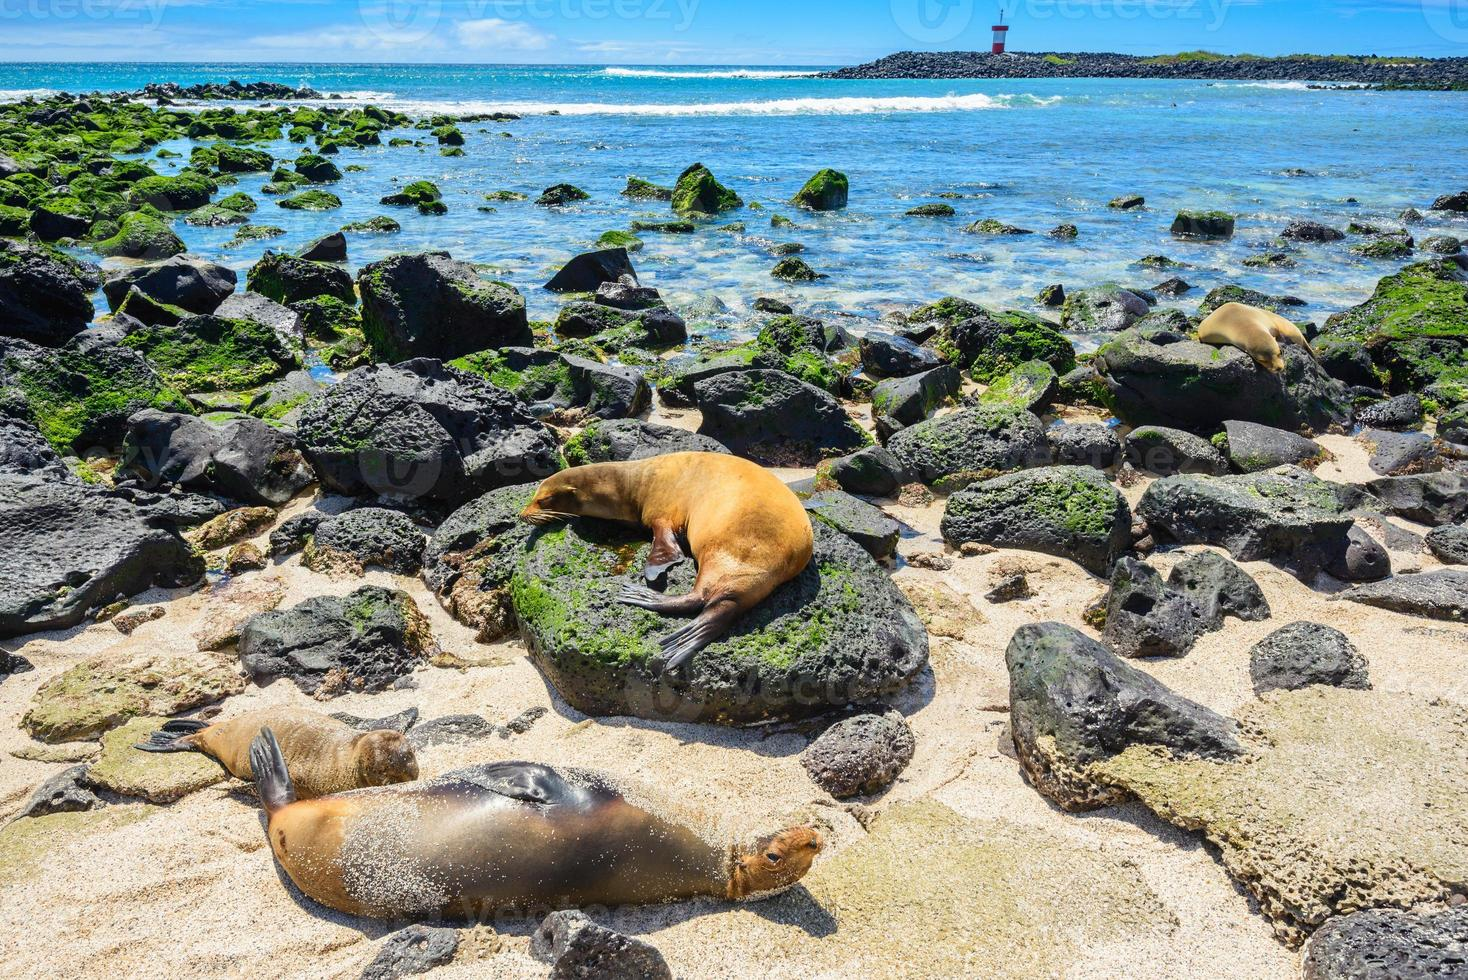 foche sulla spiaggia di punta carola, isole galapagos (ecuador) foto